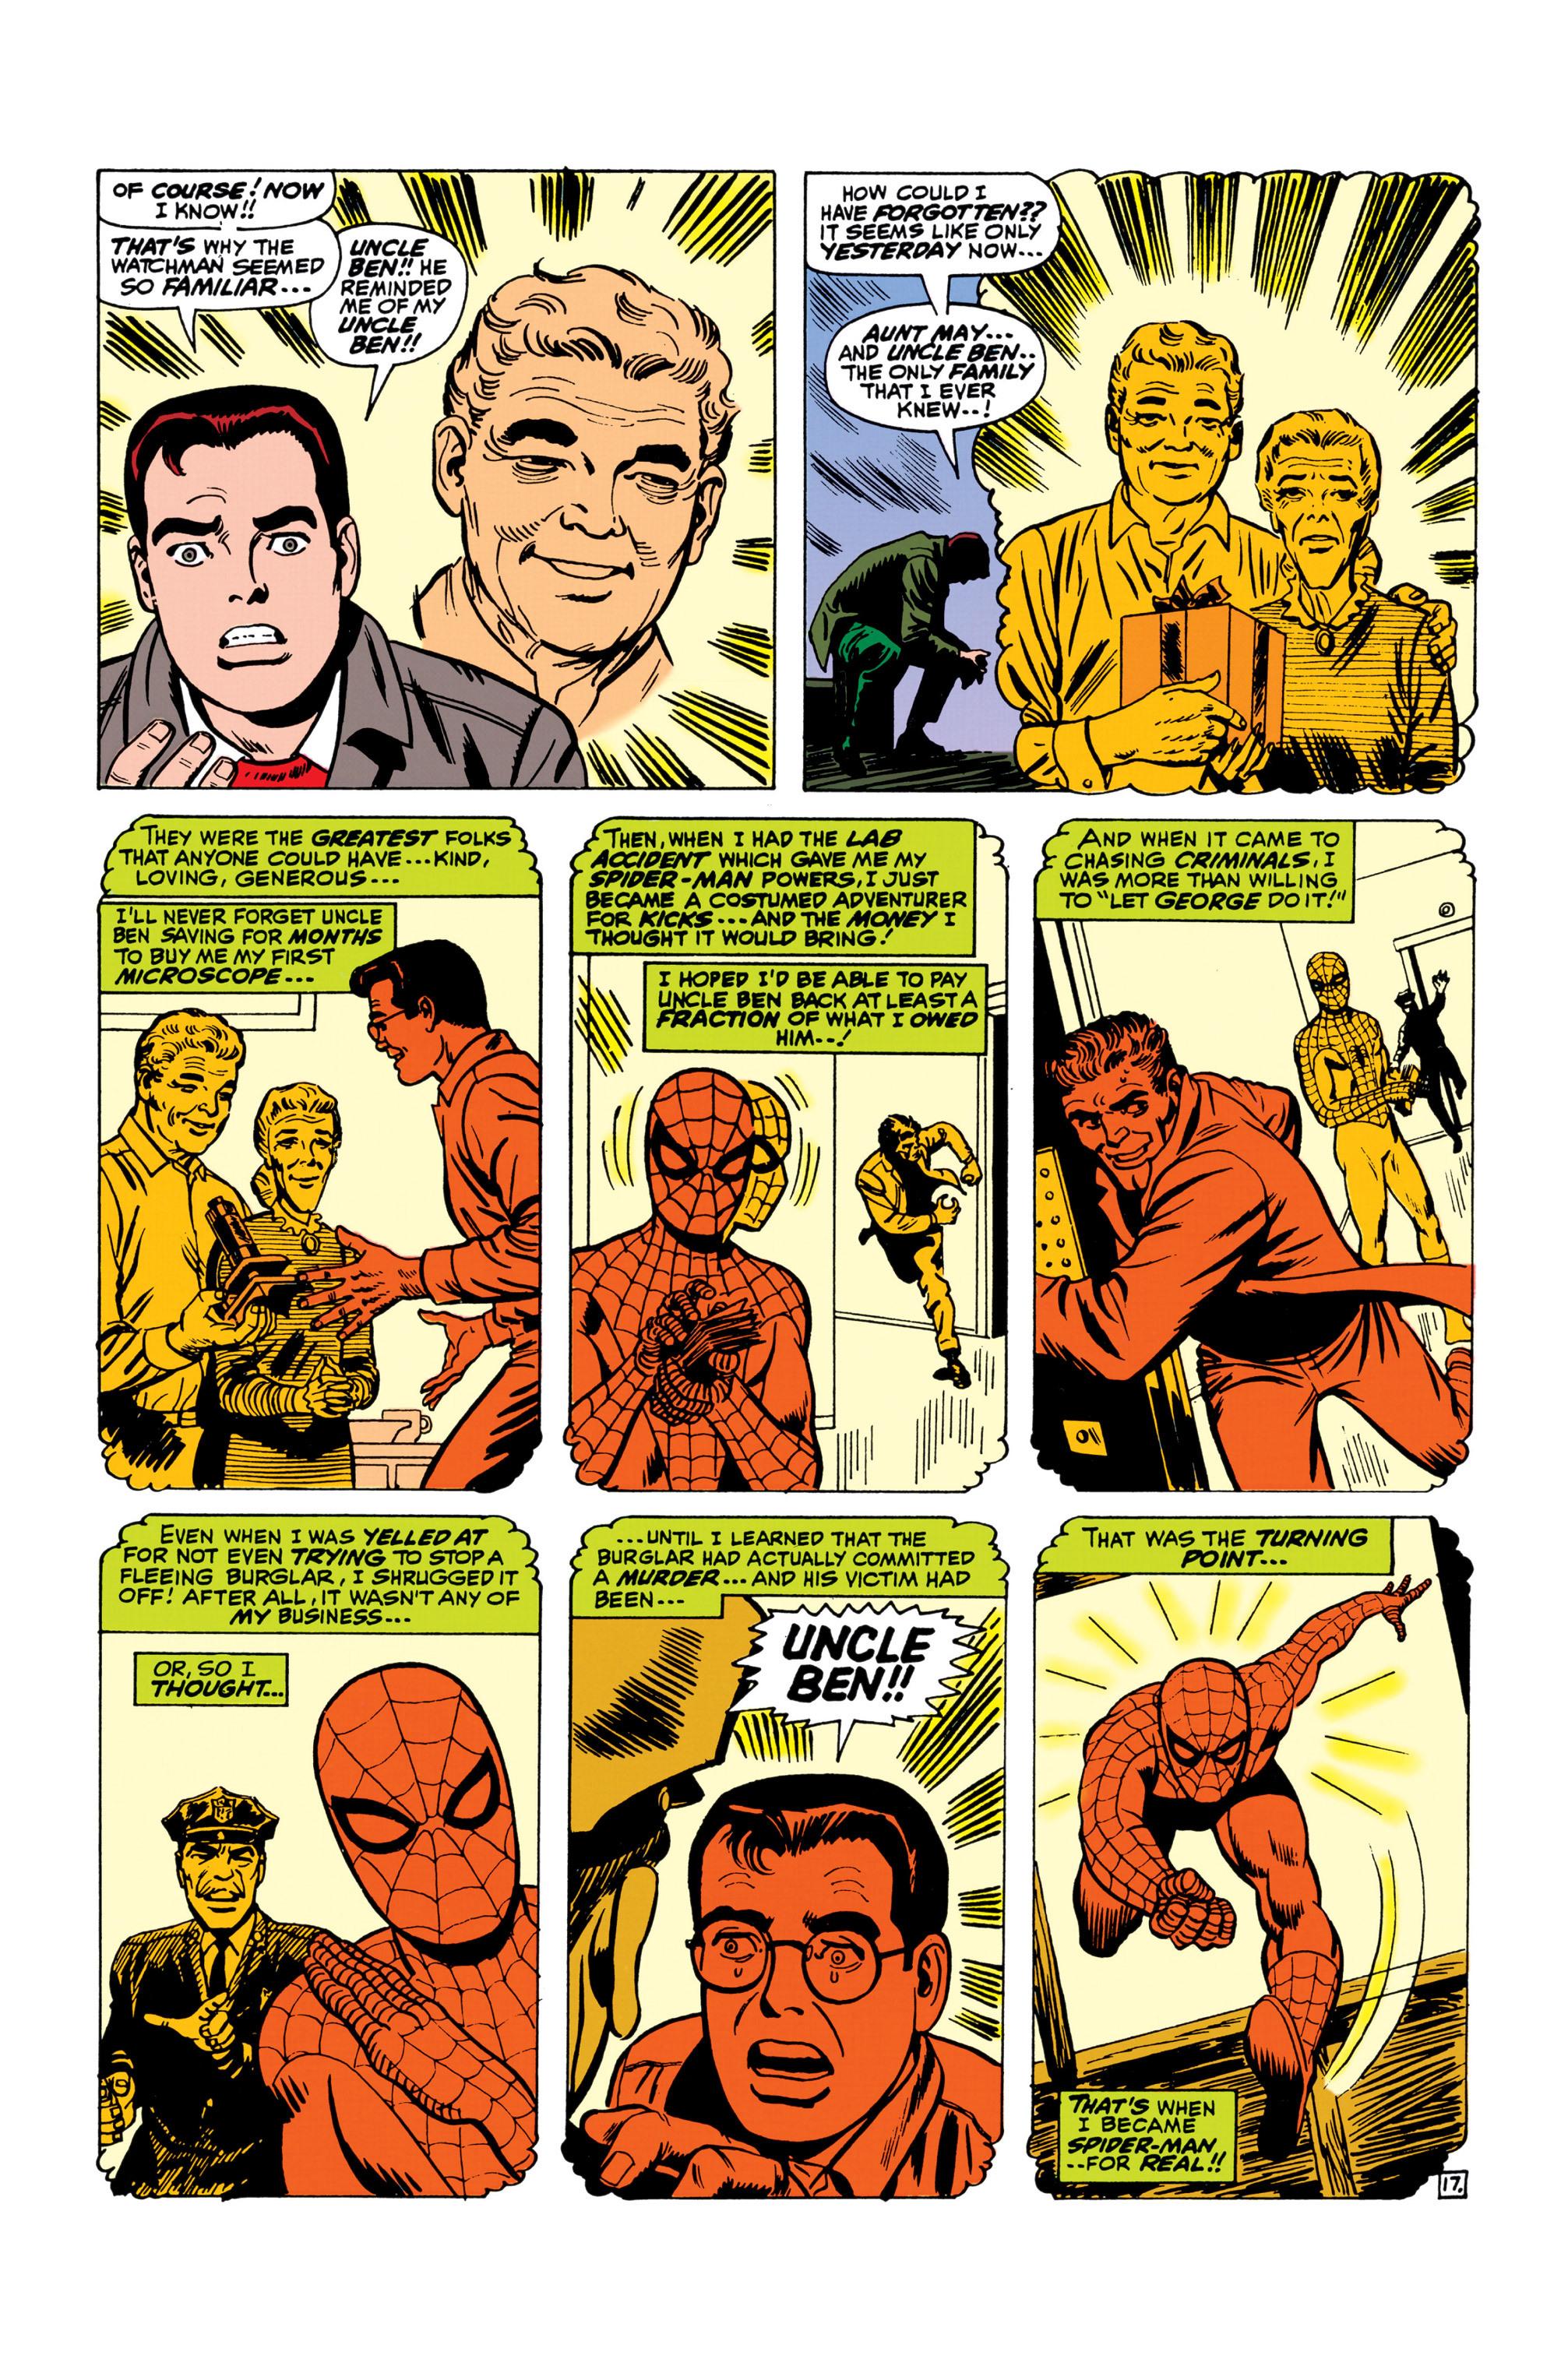 Spider-Man Character Study ― The Ultimate Essay 4ezXngzL4Q4xF82rDuKh8BVjPsvQA-zhEY7LaclGwYI75y9-Yc-vdcAcobNRYSoR-p5cqIvhjyIN=s0